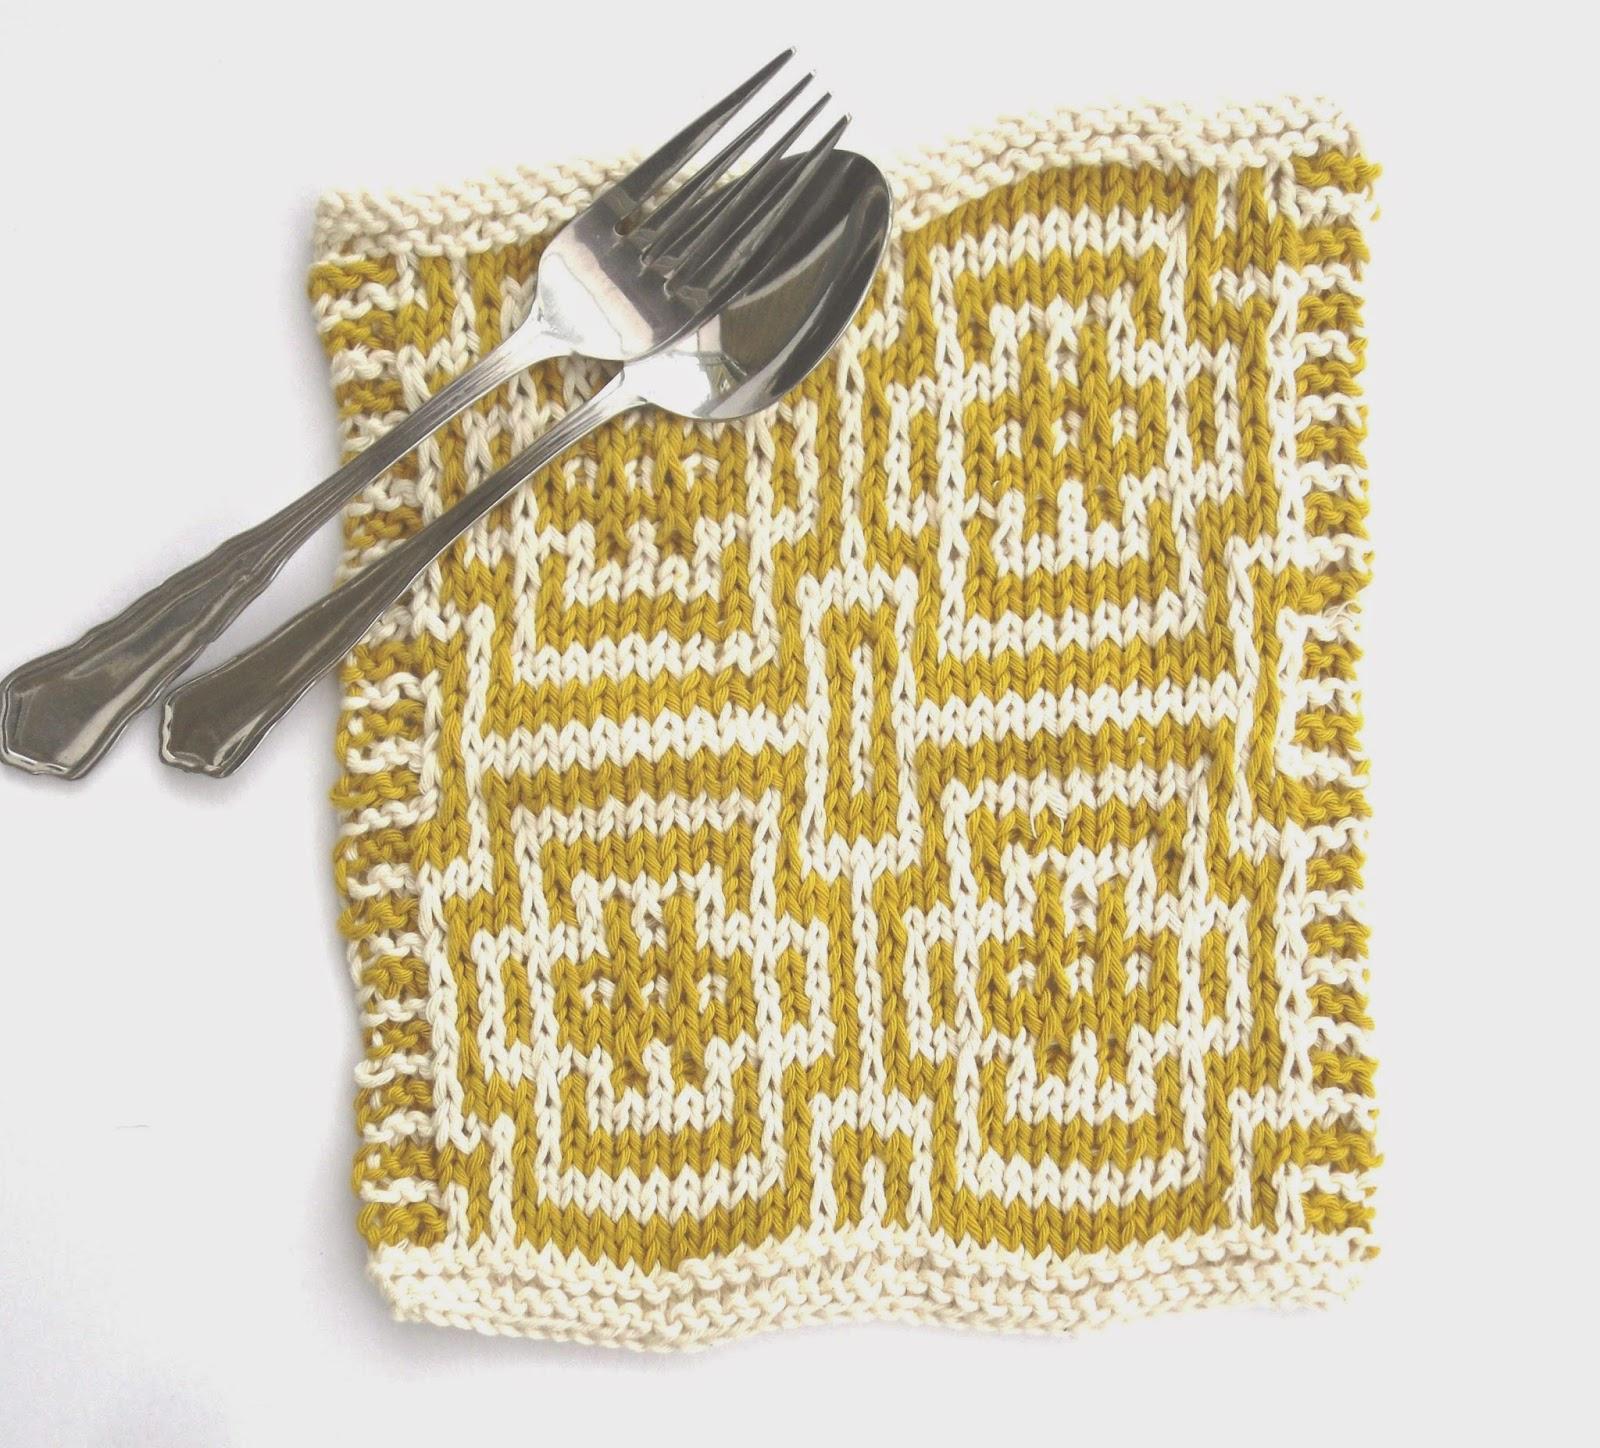 Free Mosaic Knitting Patterns : The Feminine Touch UK Knitting / Felting blog: Free Mosaic Pattern for a sc...